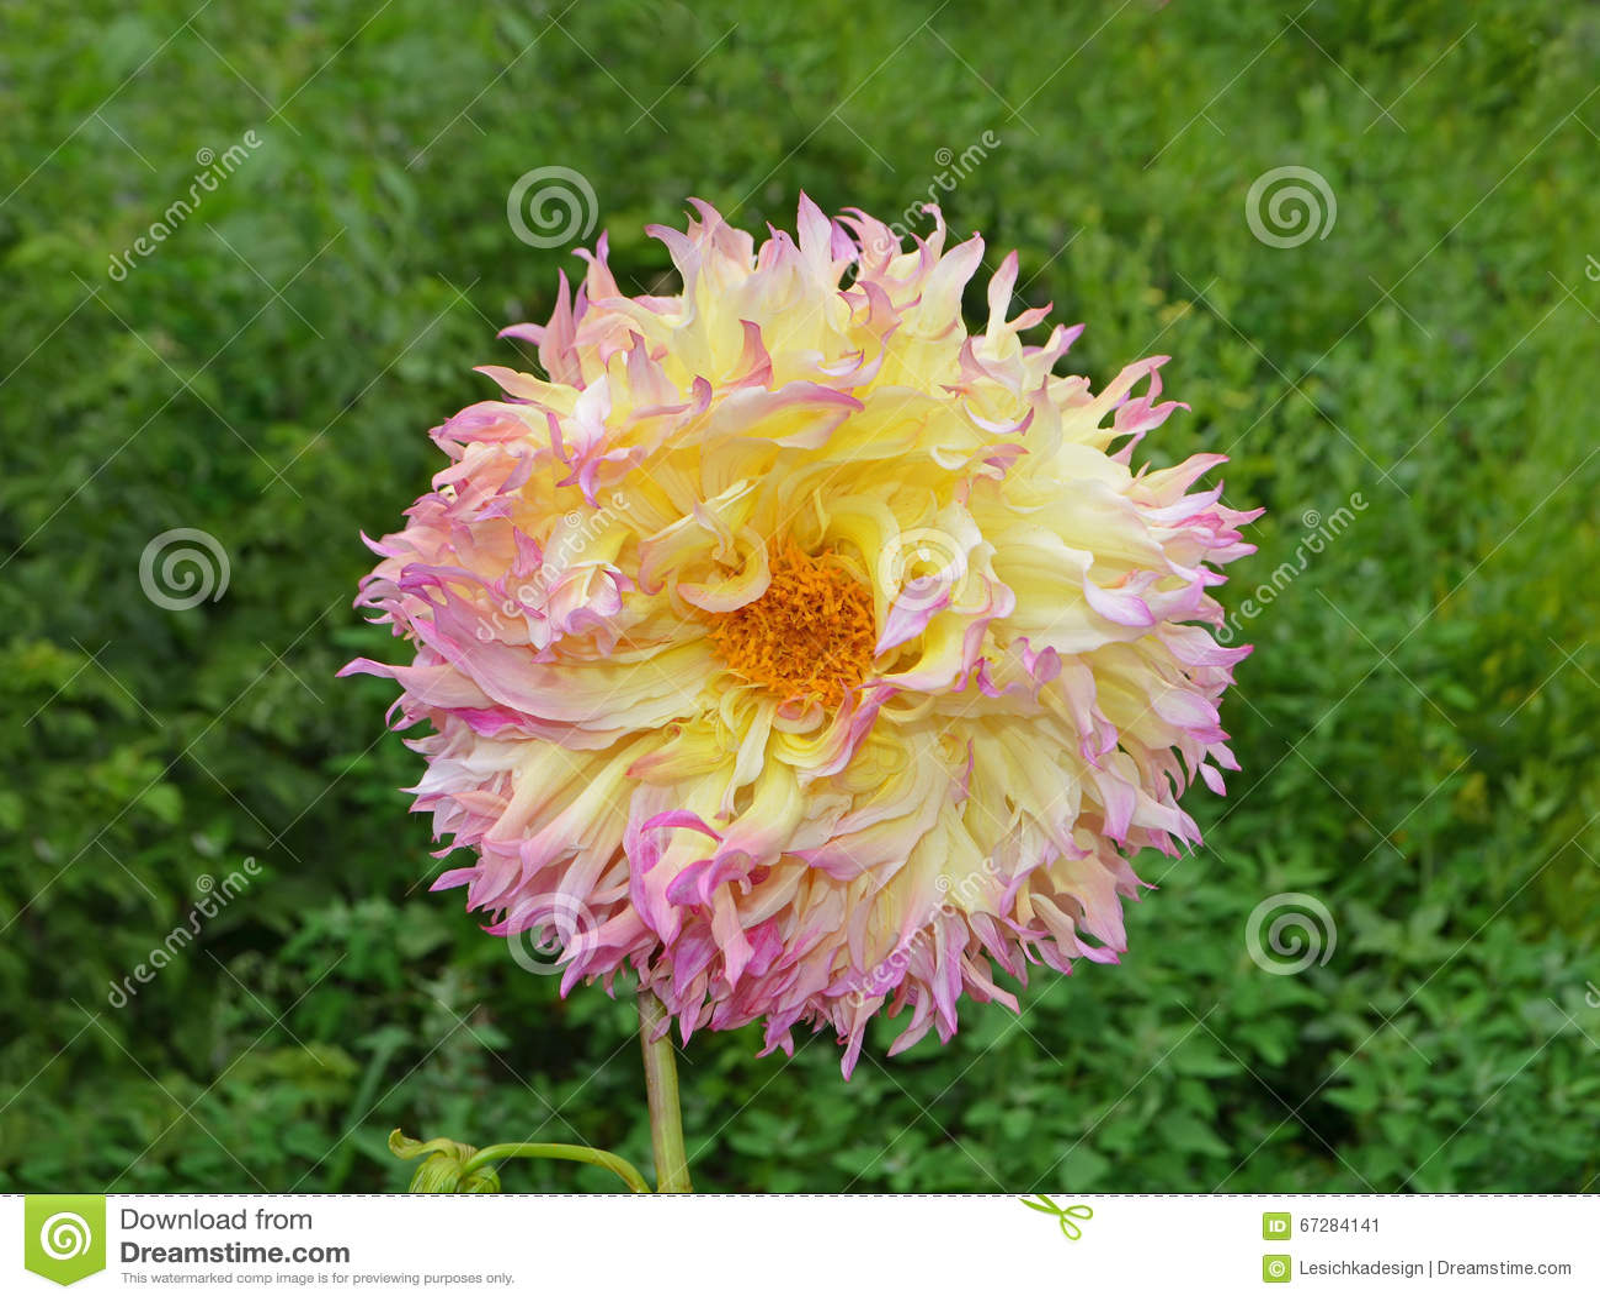 Yellow Pink And Orange Dahlia Flower In Garden Stock Image Image